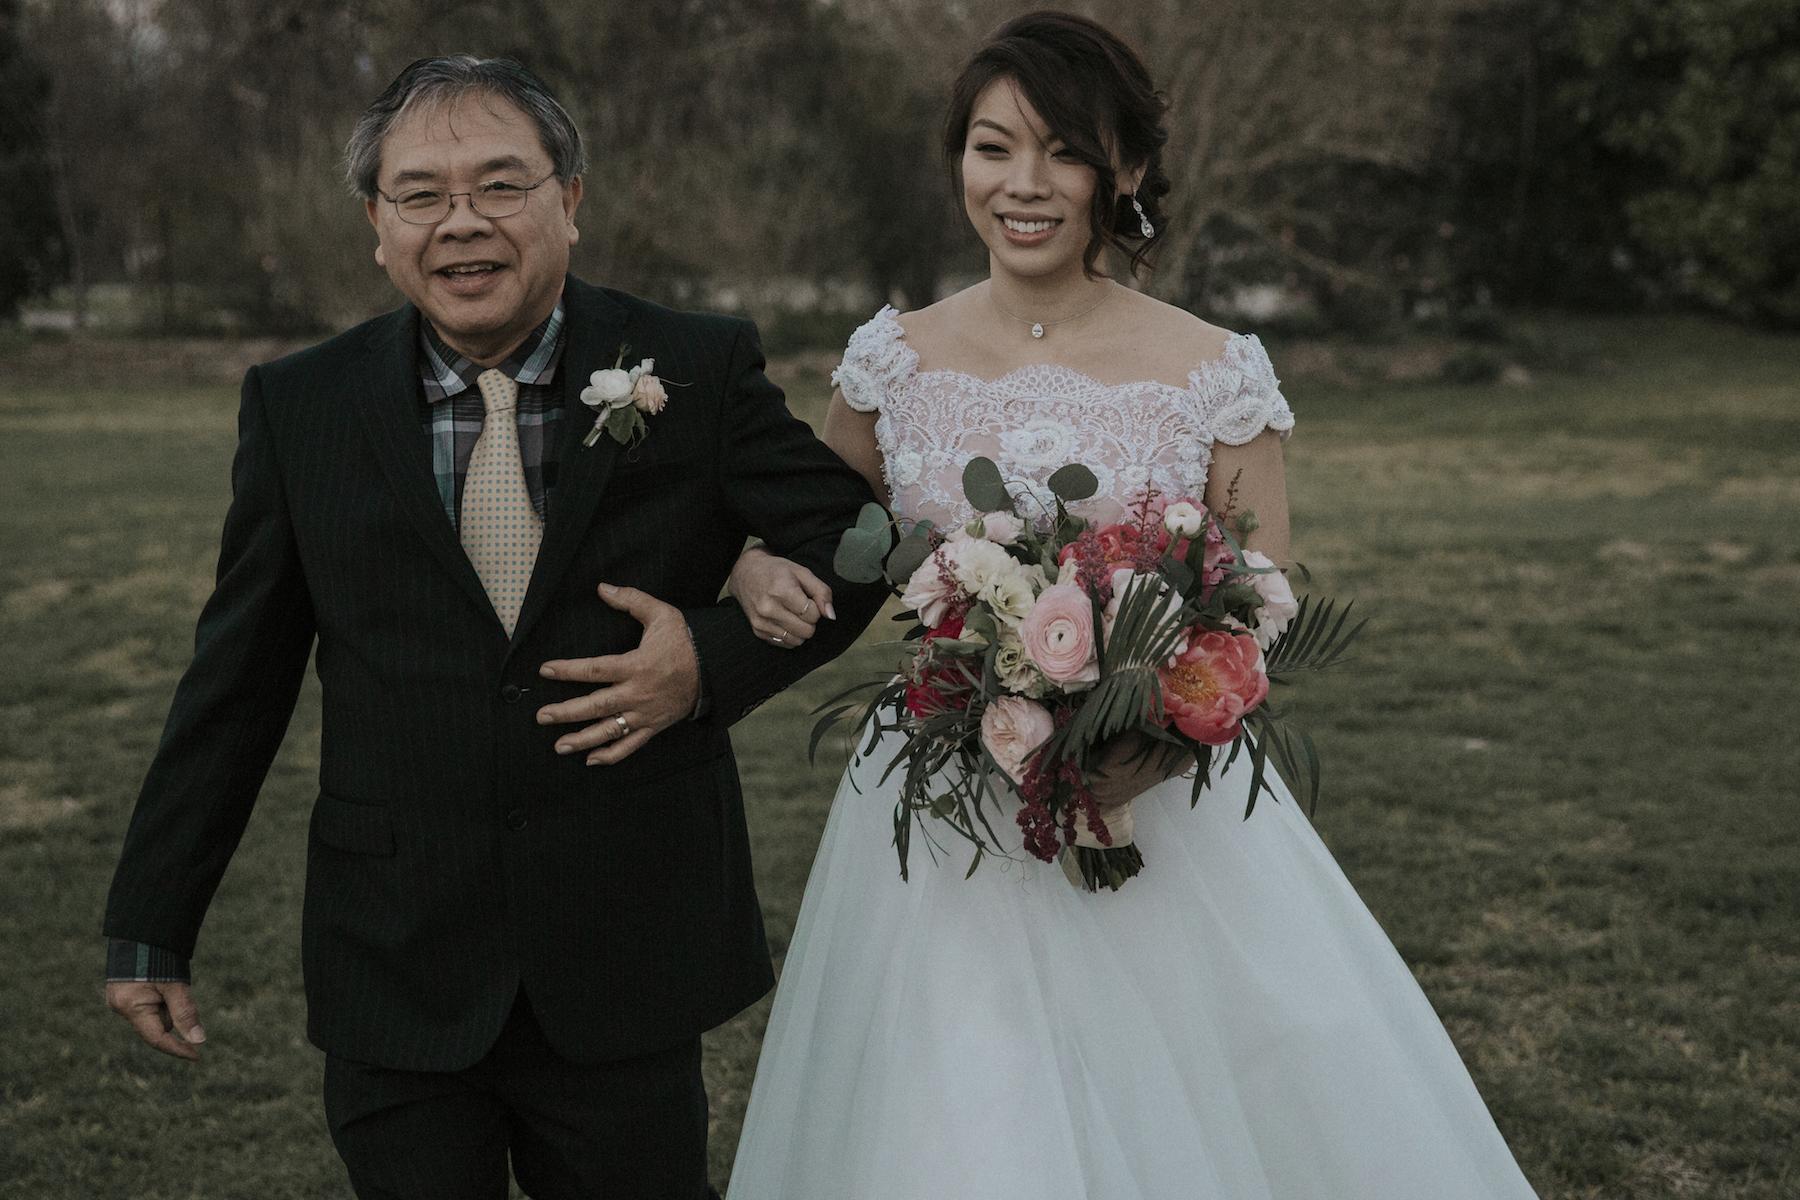 barr-mansion-wedding-austin-texas8887.JPG